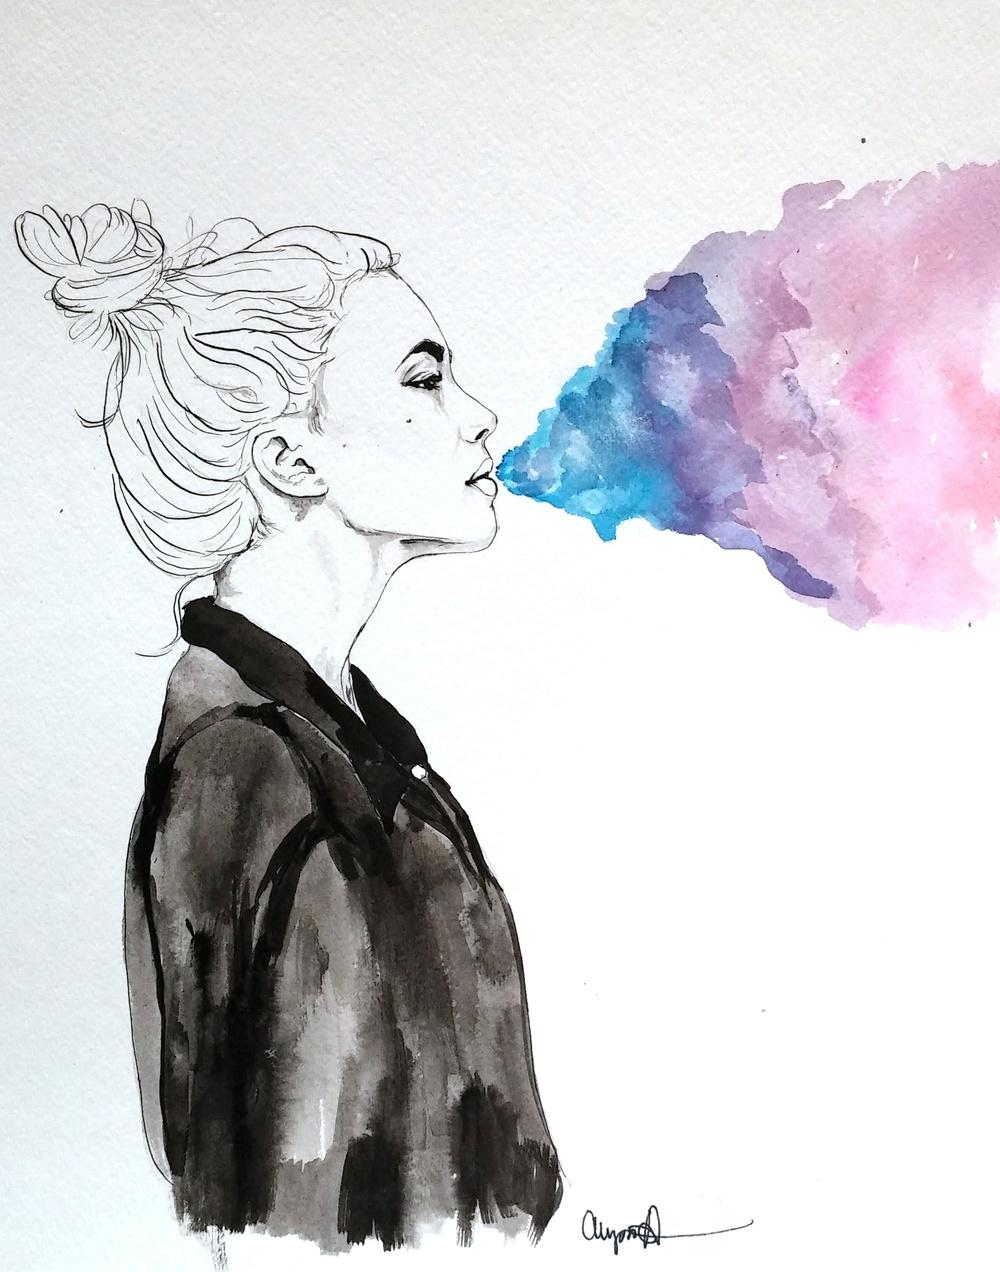 breatheitin.jpg